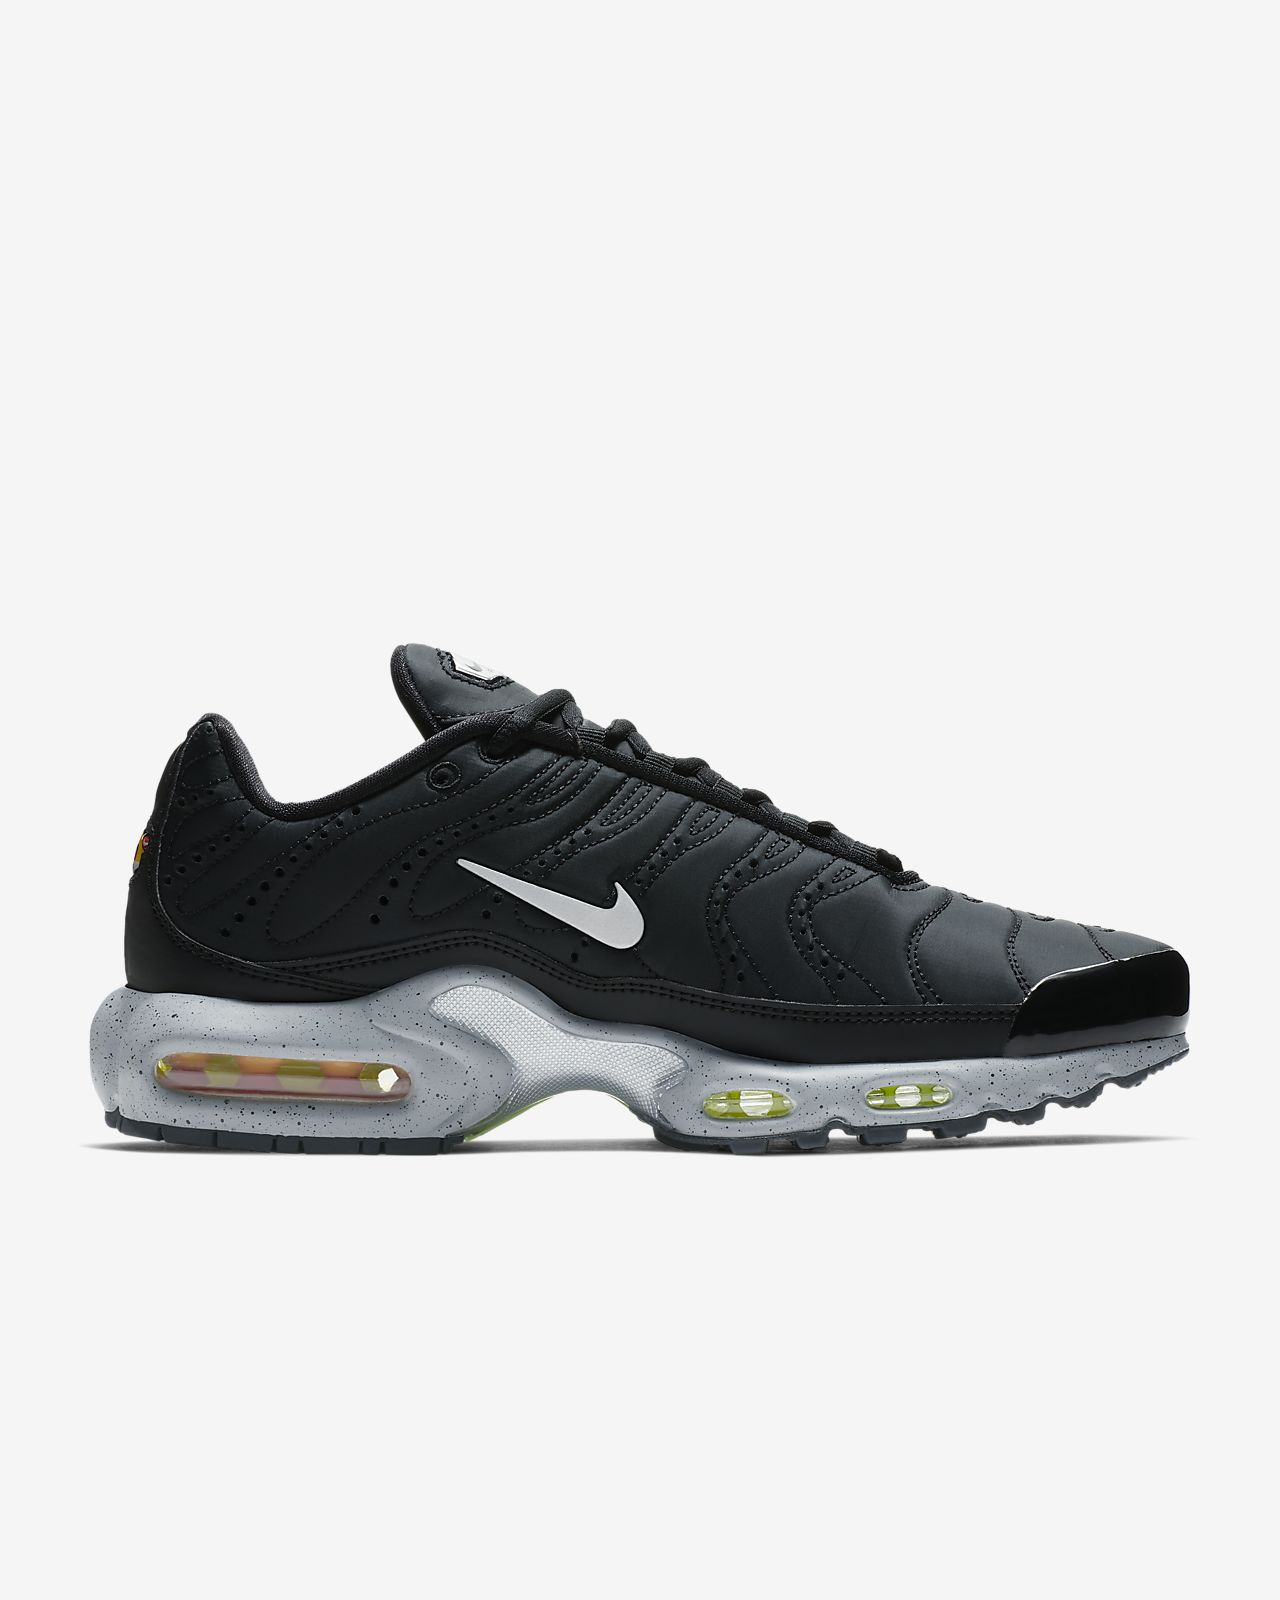 separation shoes e1983 28407 ... Nike Air Max Plus Premium-sko til mænd